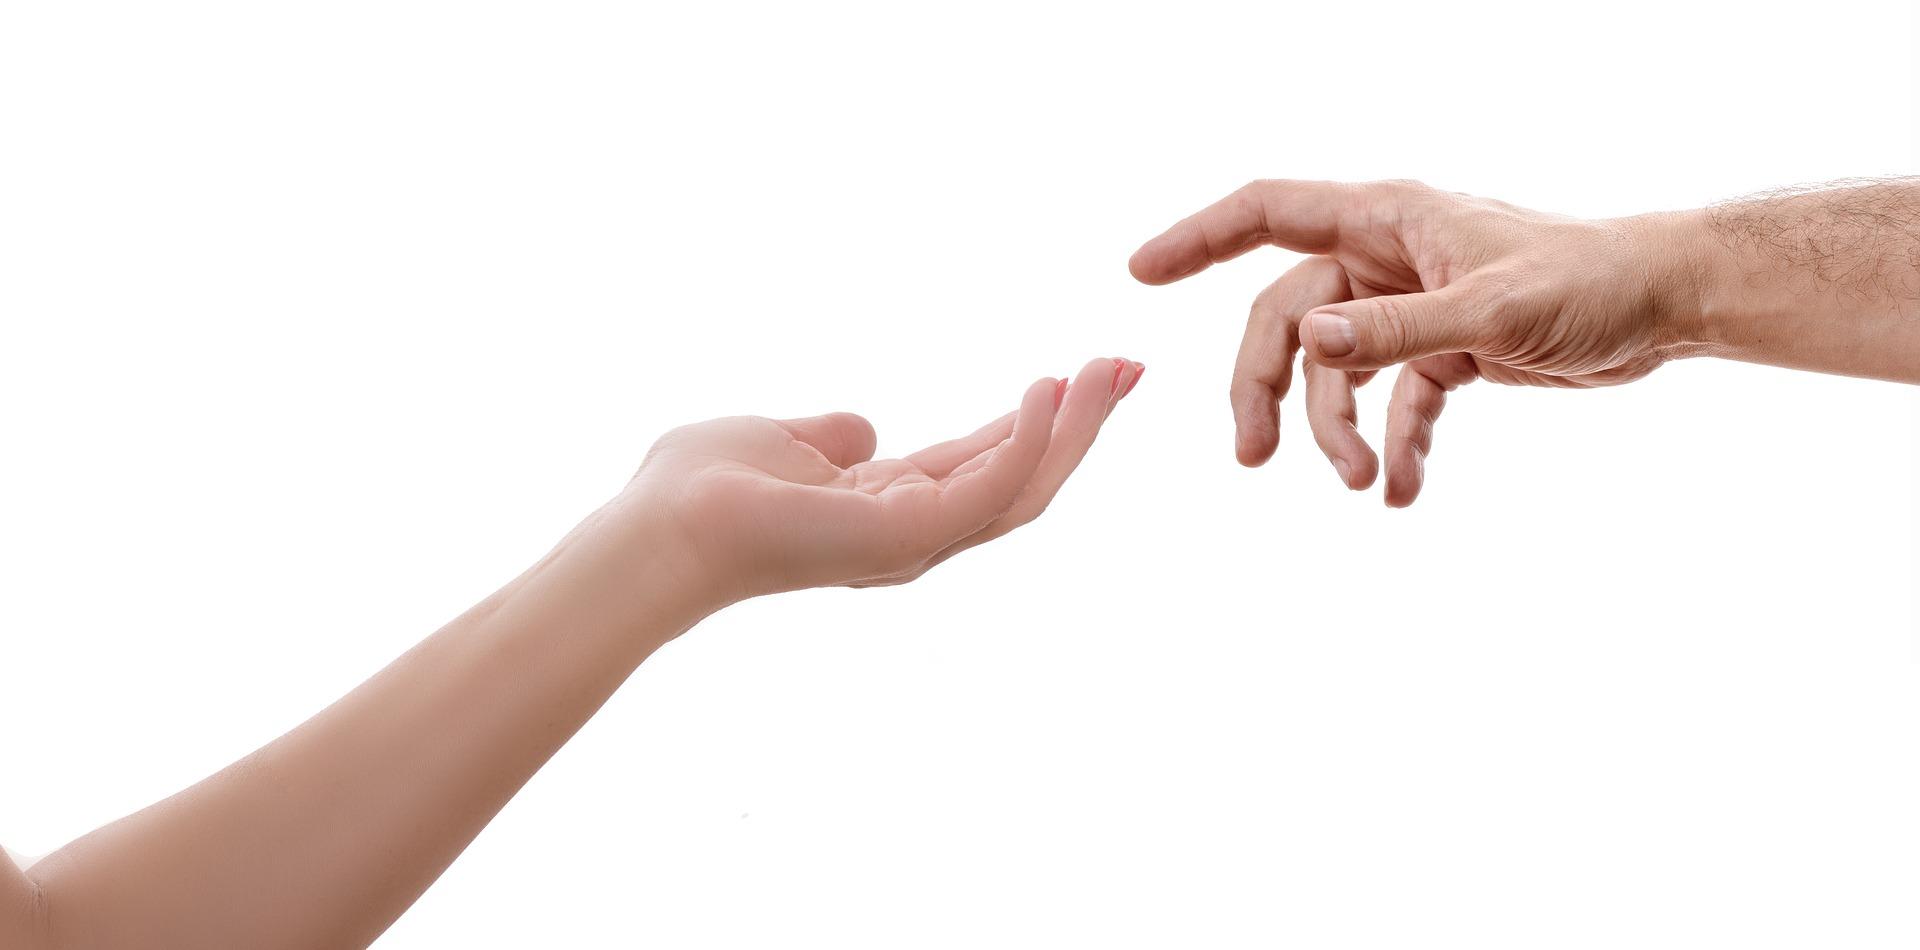 Hand Mann Frau Kontakt